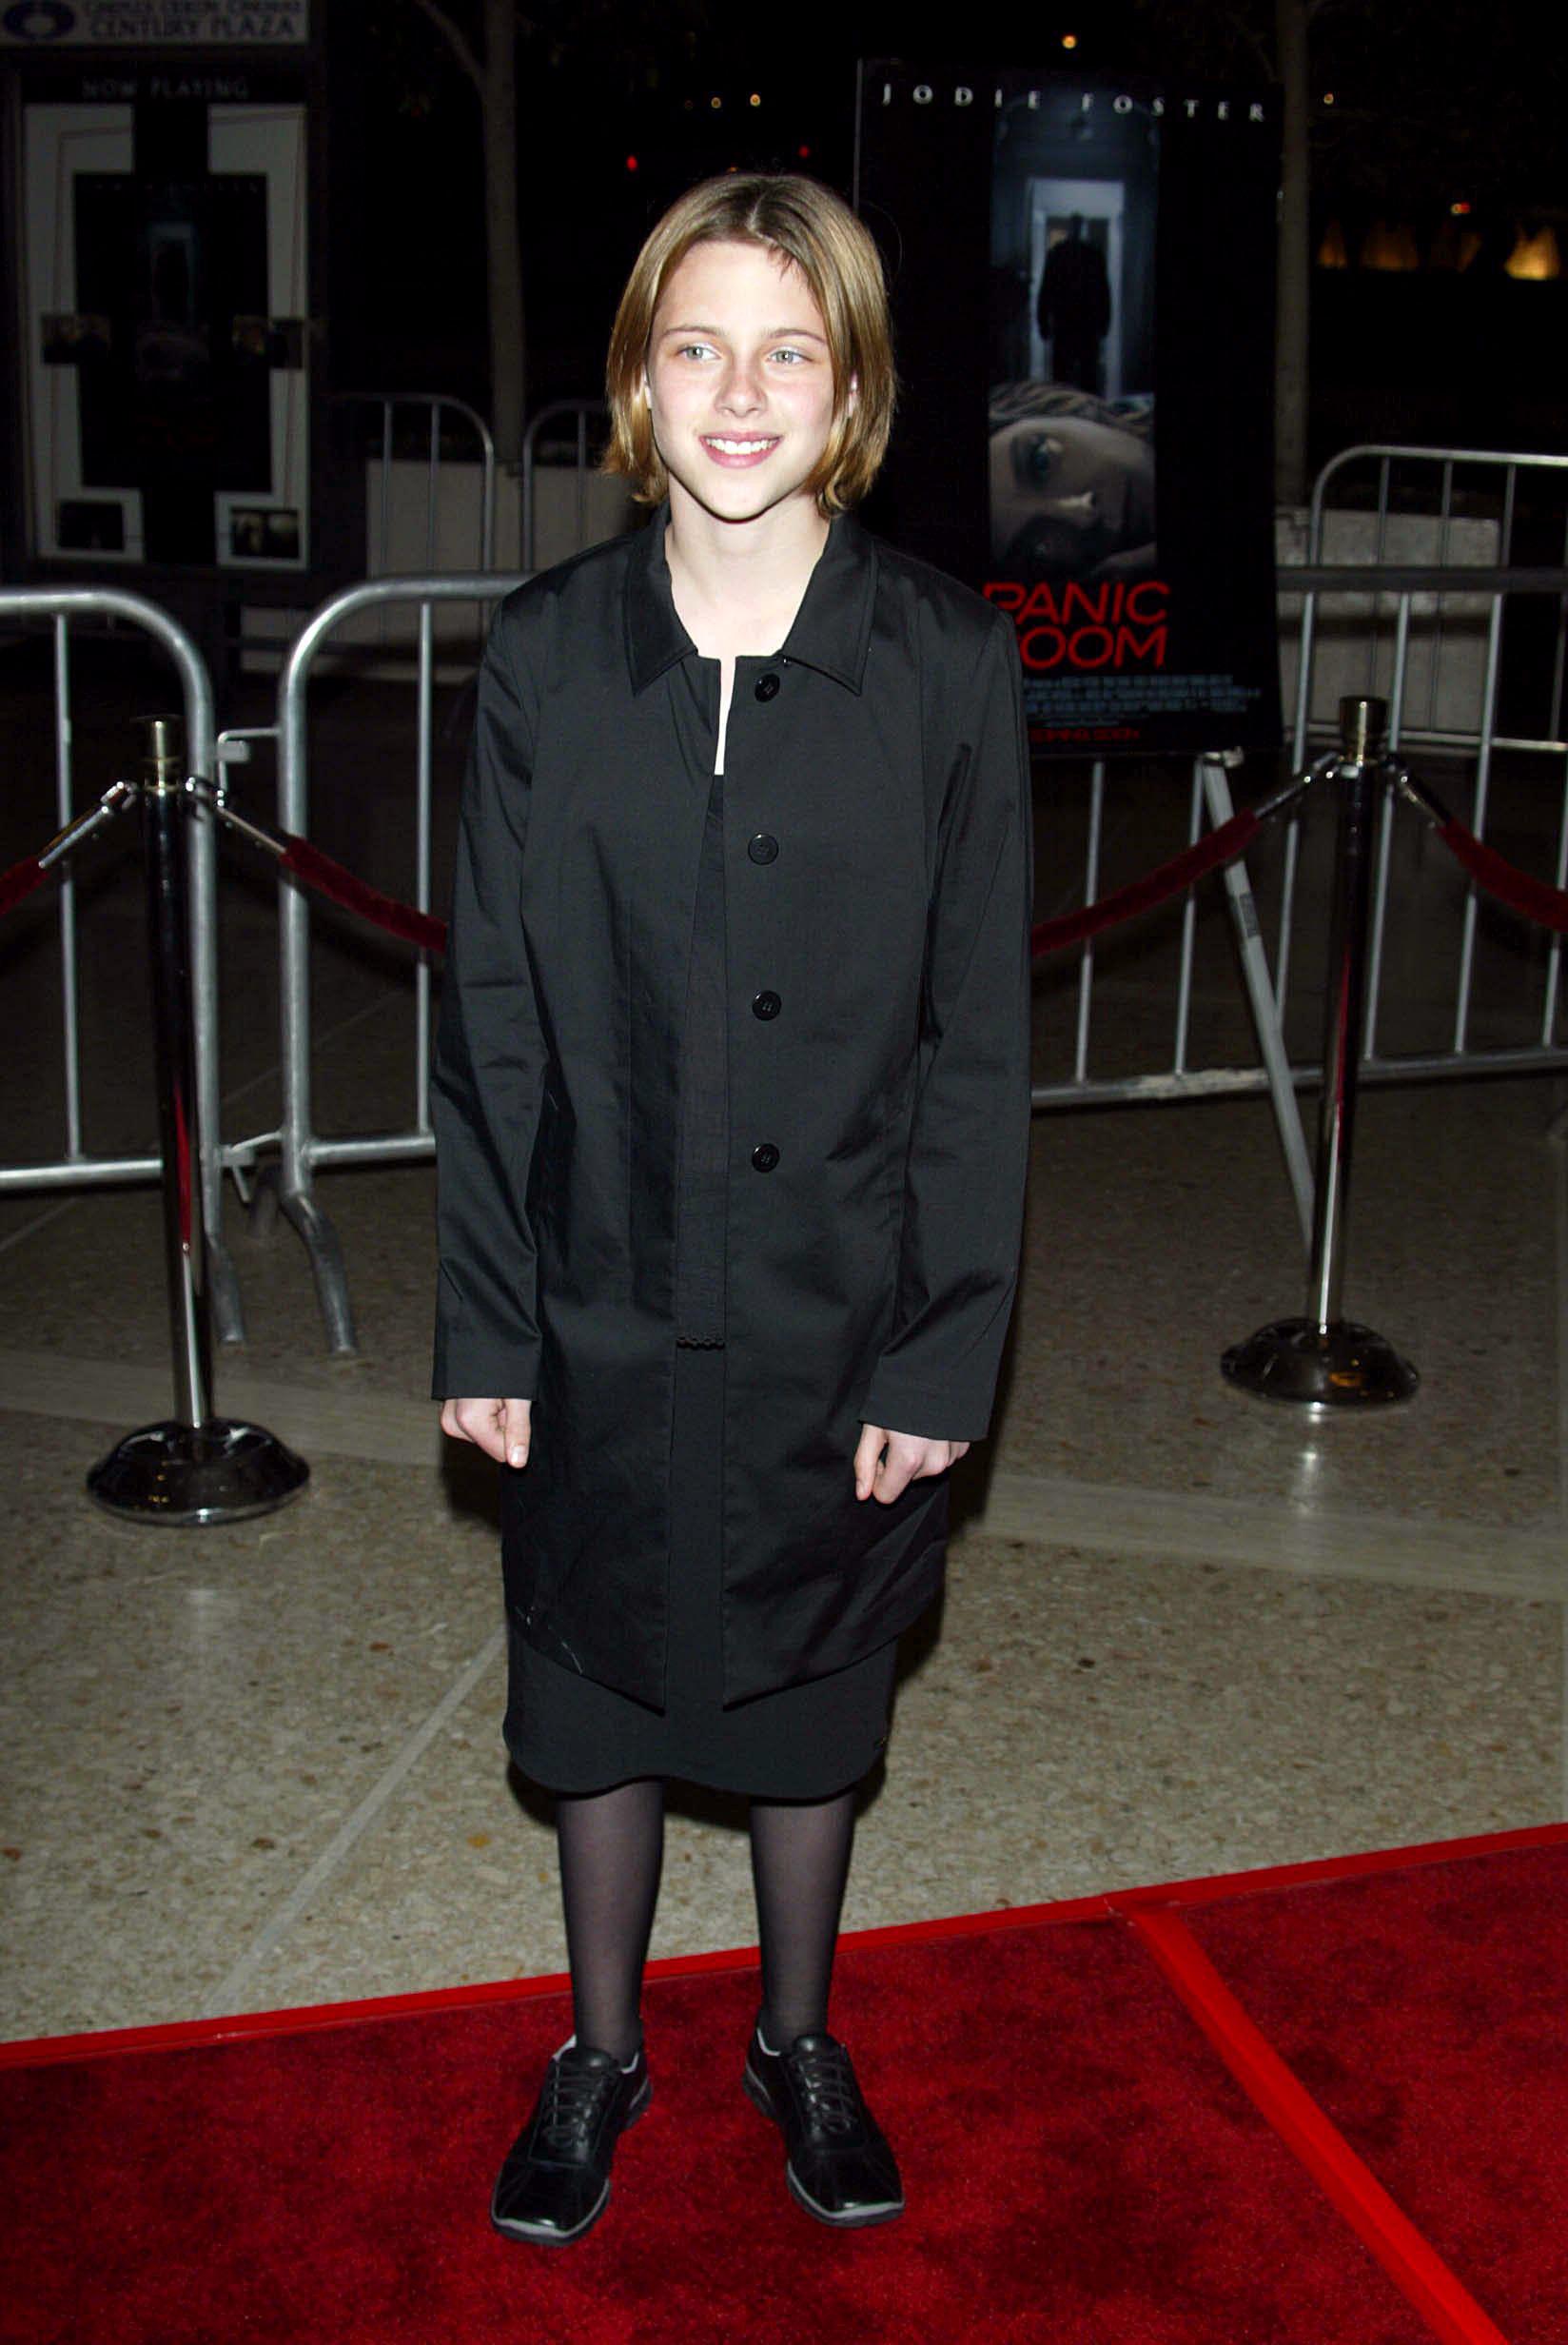 Kristen Stewart panic room